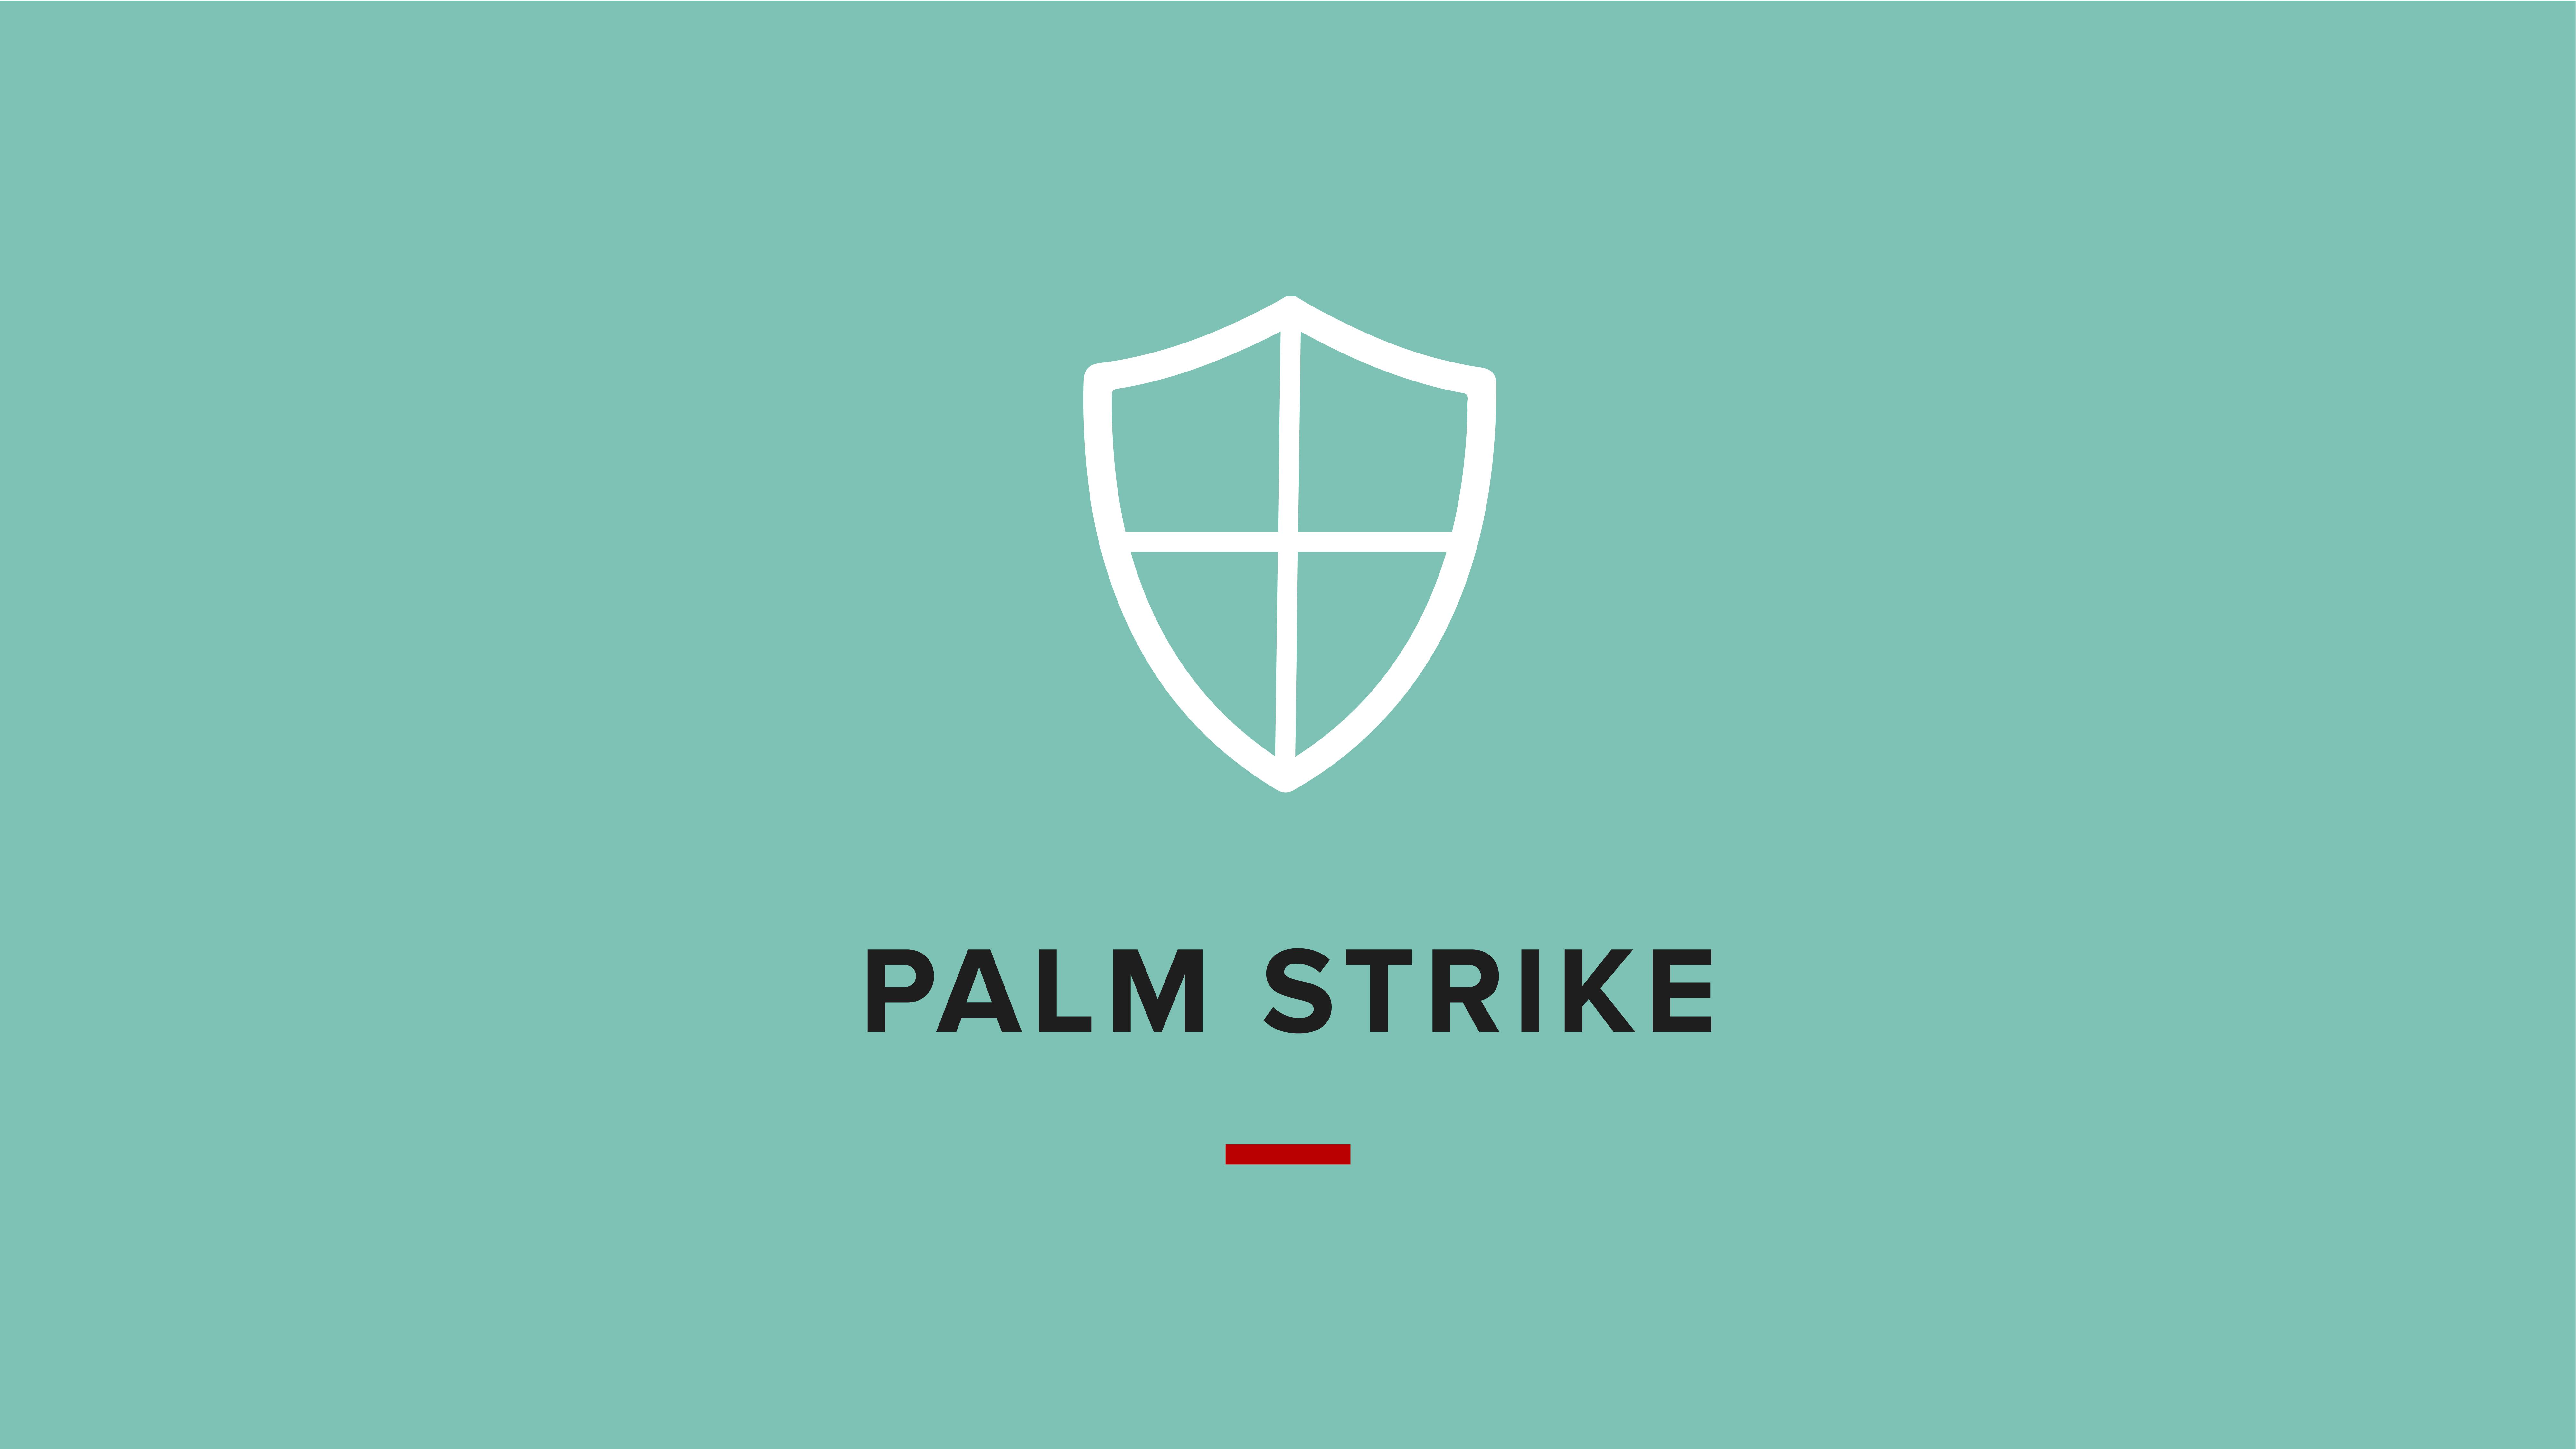 Palm Strike Graphic